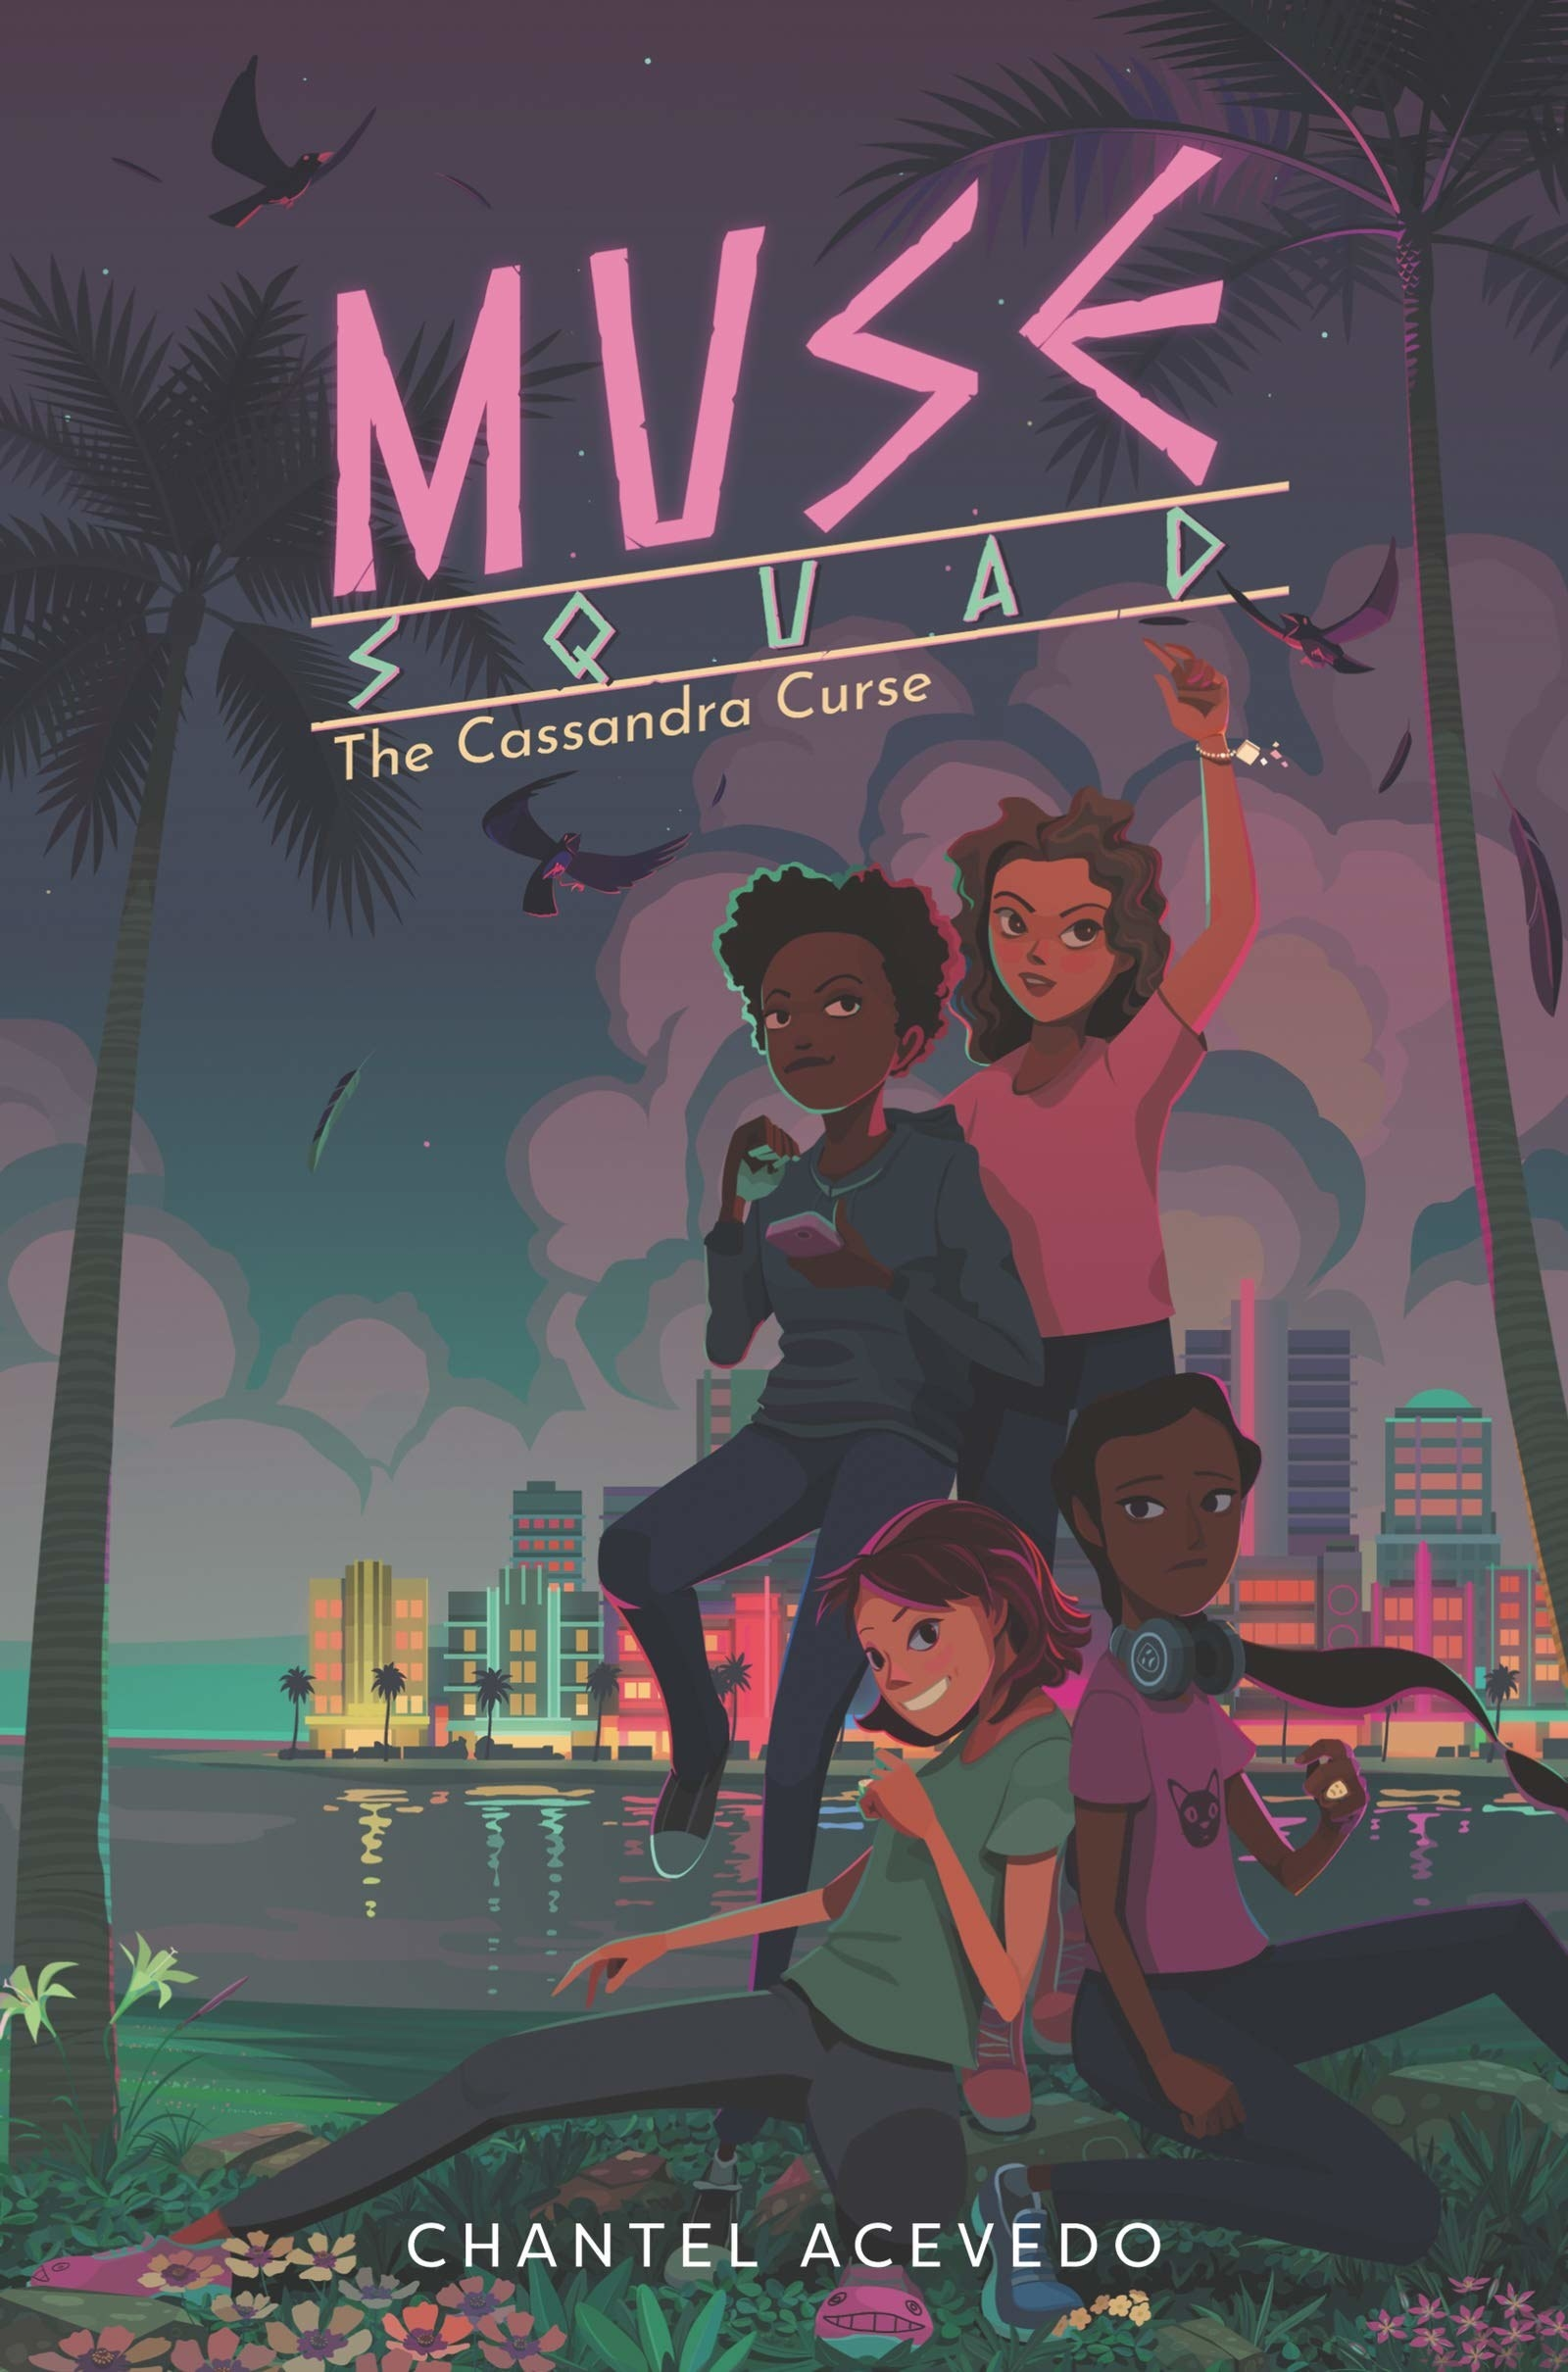 The Cassandra Curse: Muse Squad cover. Book by Chantel Acevedo.